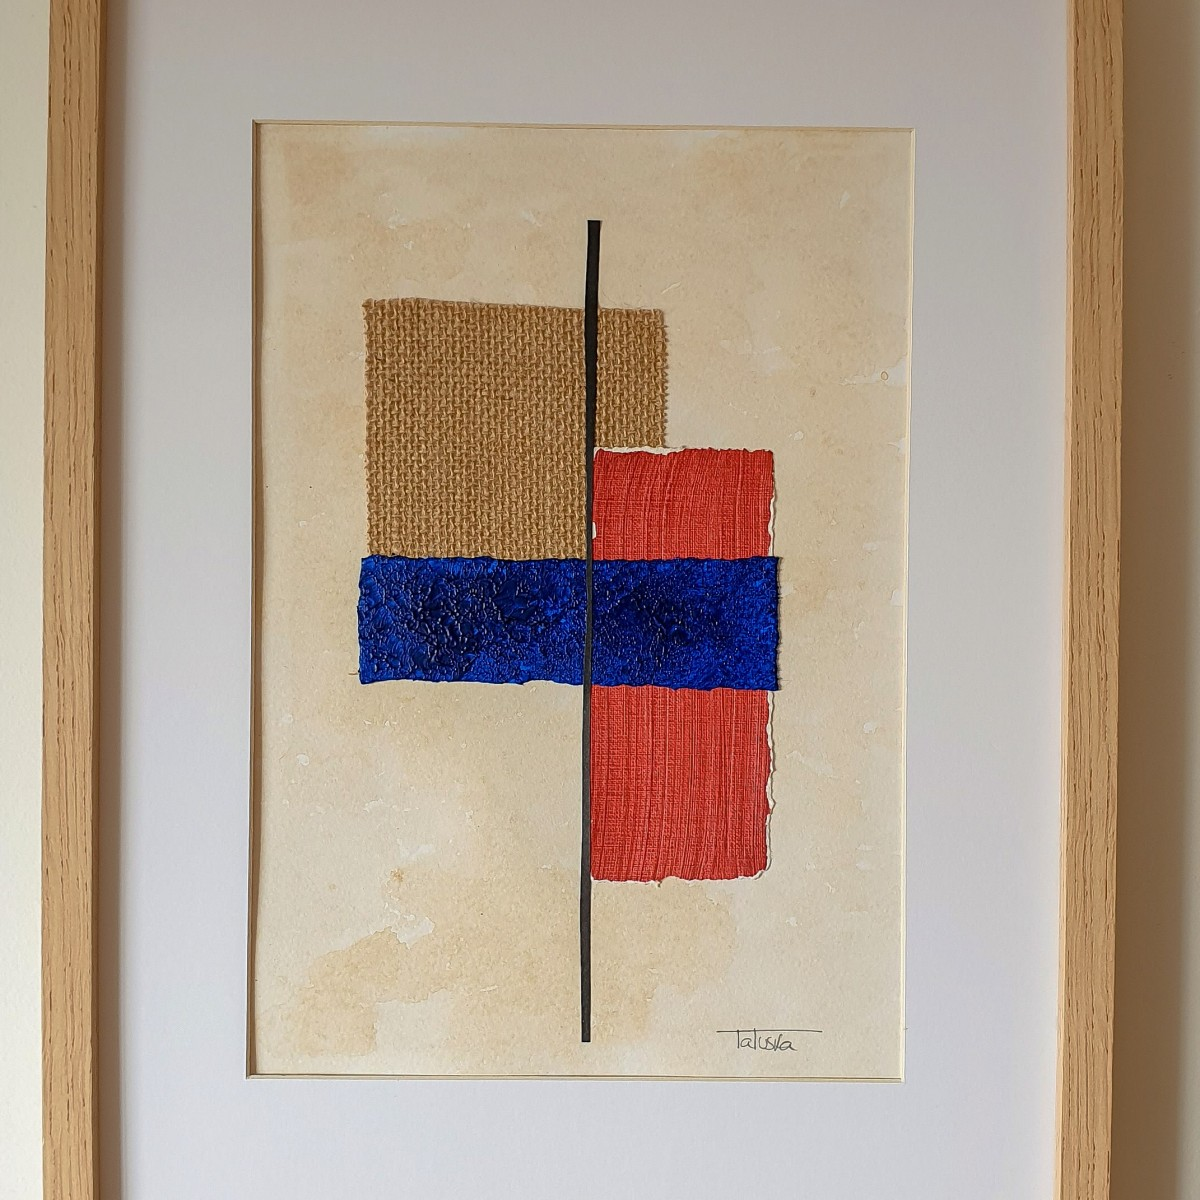 "Cuadro de arte abstracto titulado ""Metamorphosis"" de la artista Tatuska (https://artuska.com)"